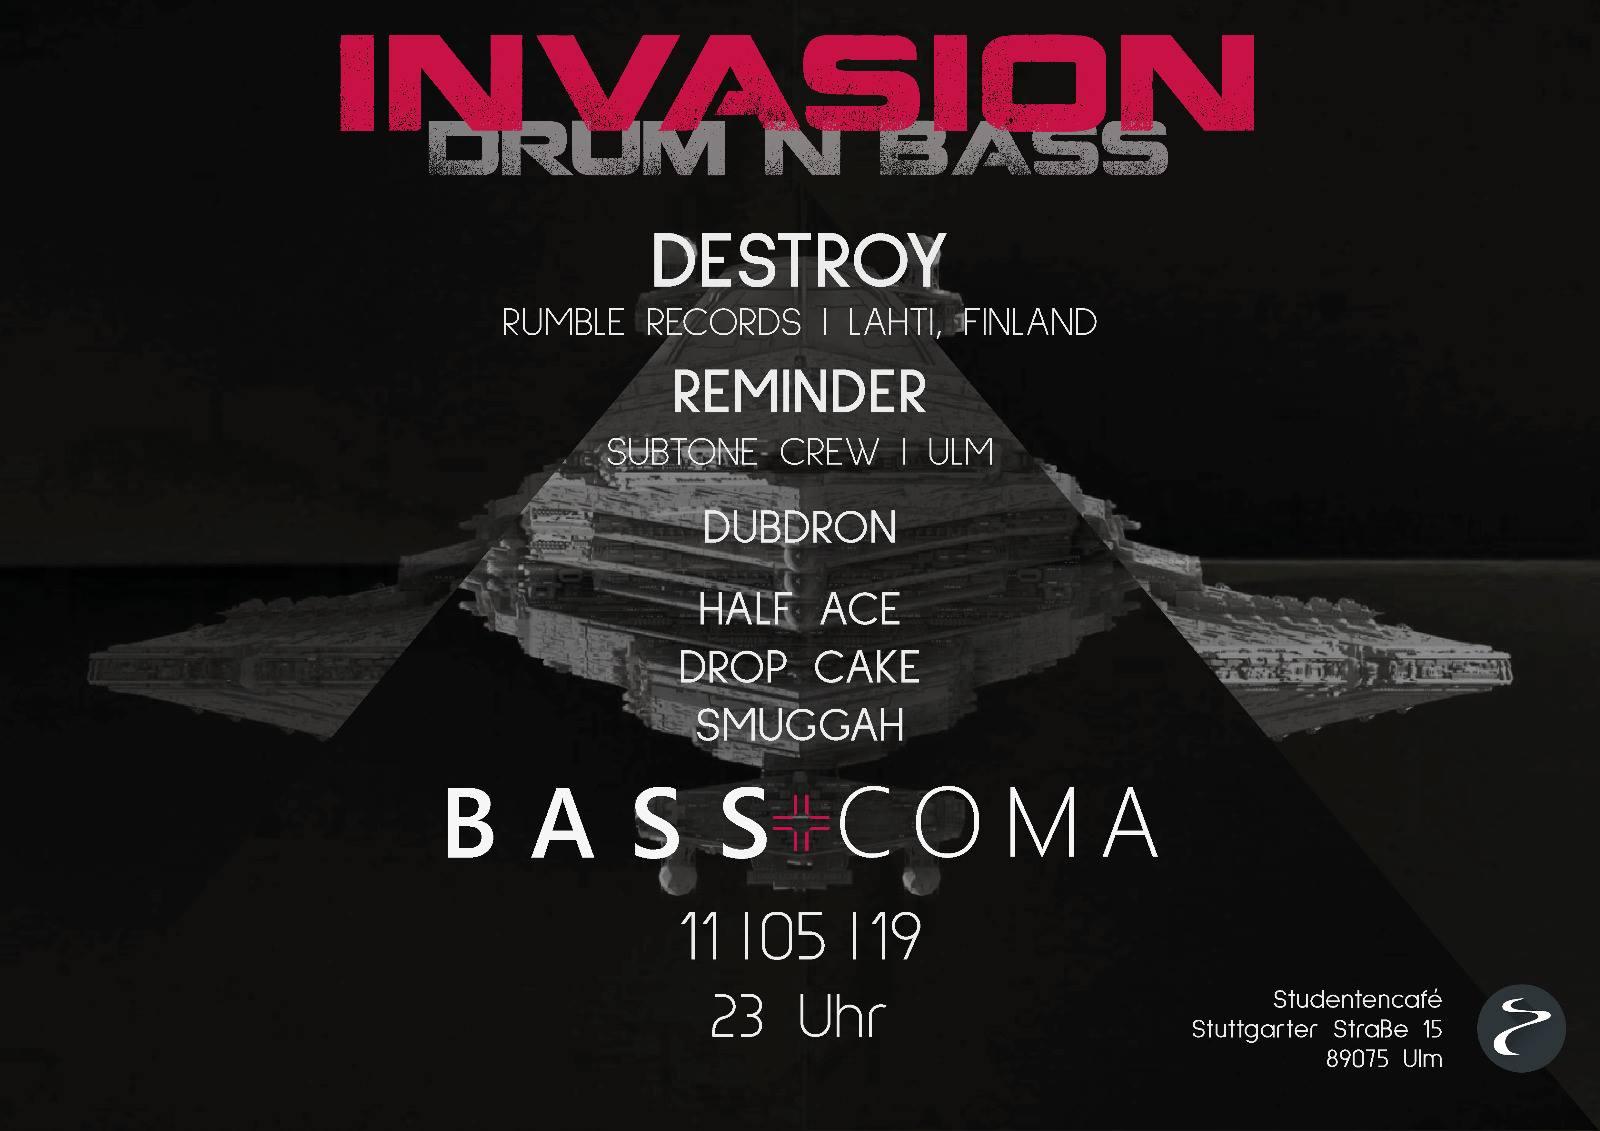 Bass+Coma im Studentencafe Invasion Drum n Bass